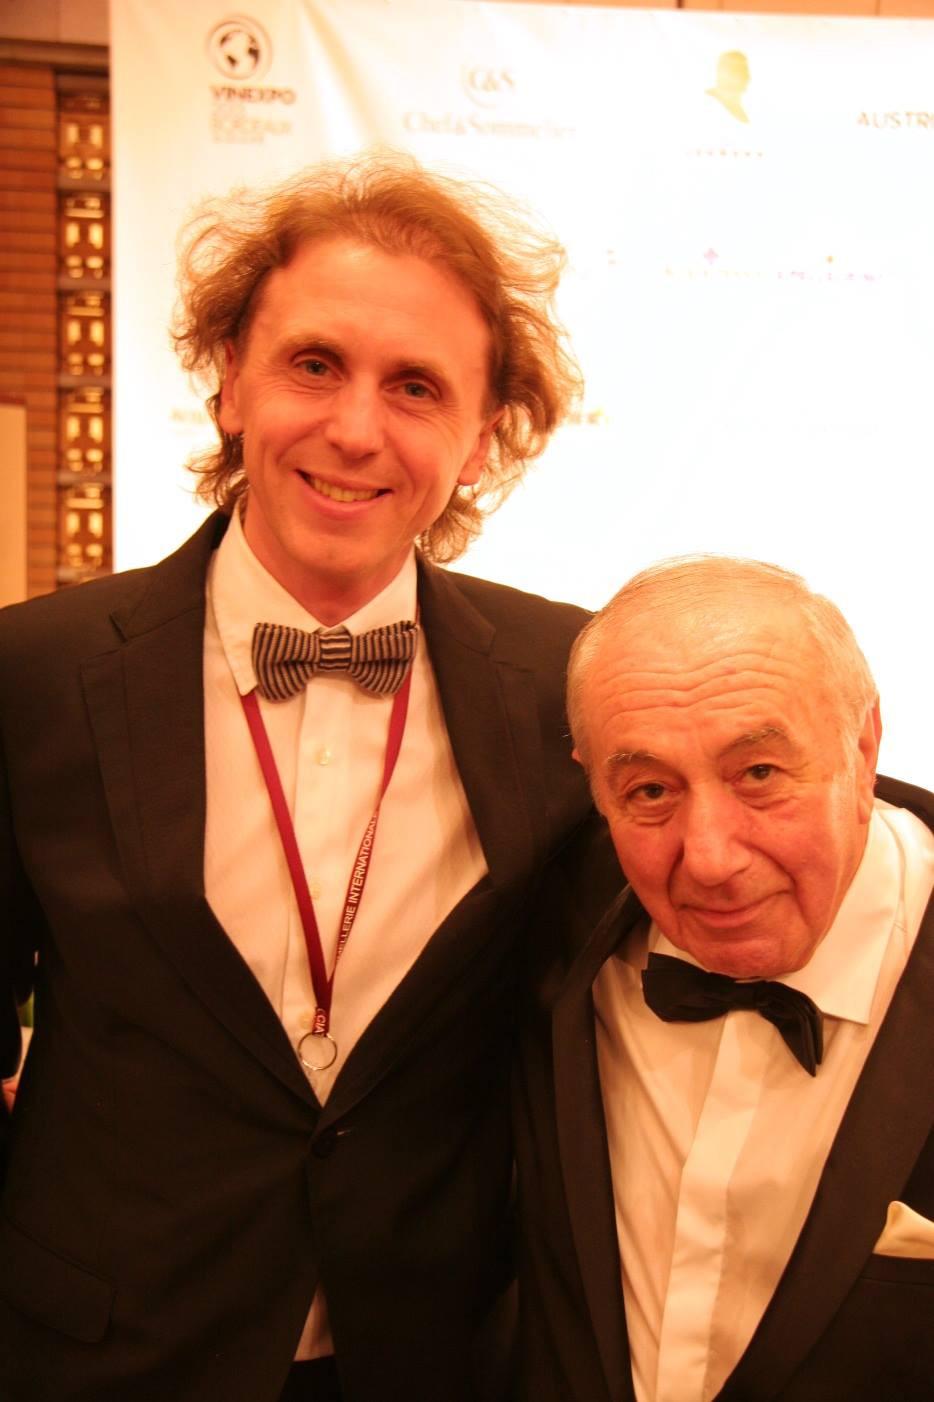 Arūnas with Armand Melkonian (1st world champion)